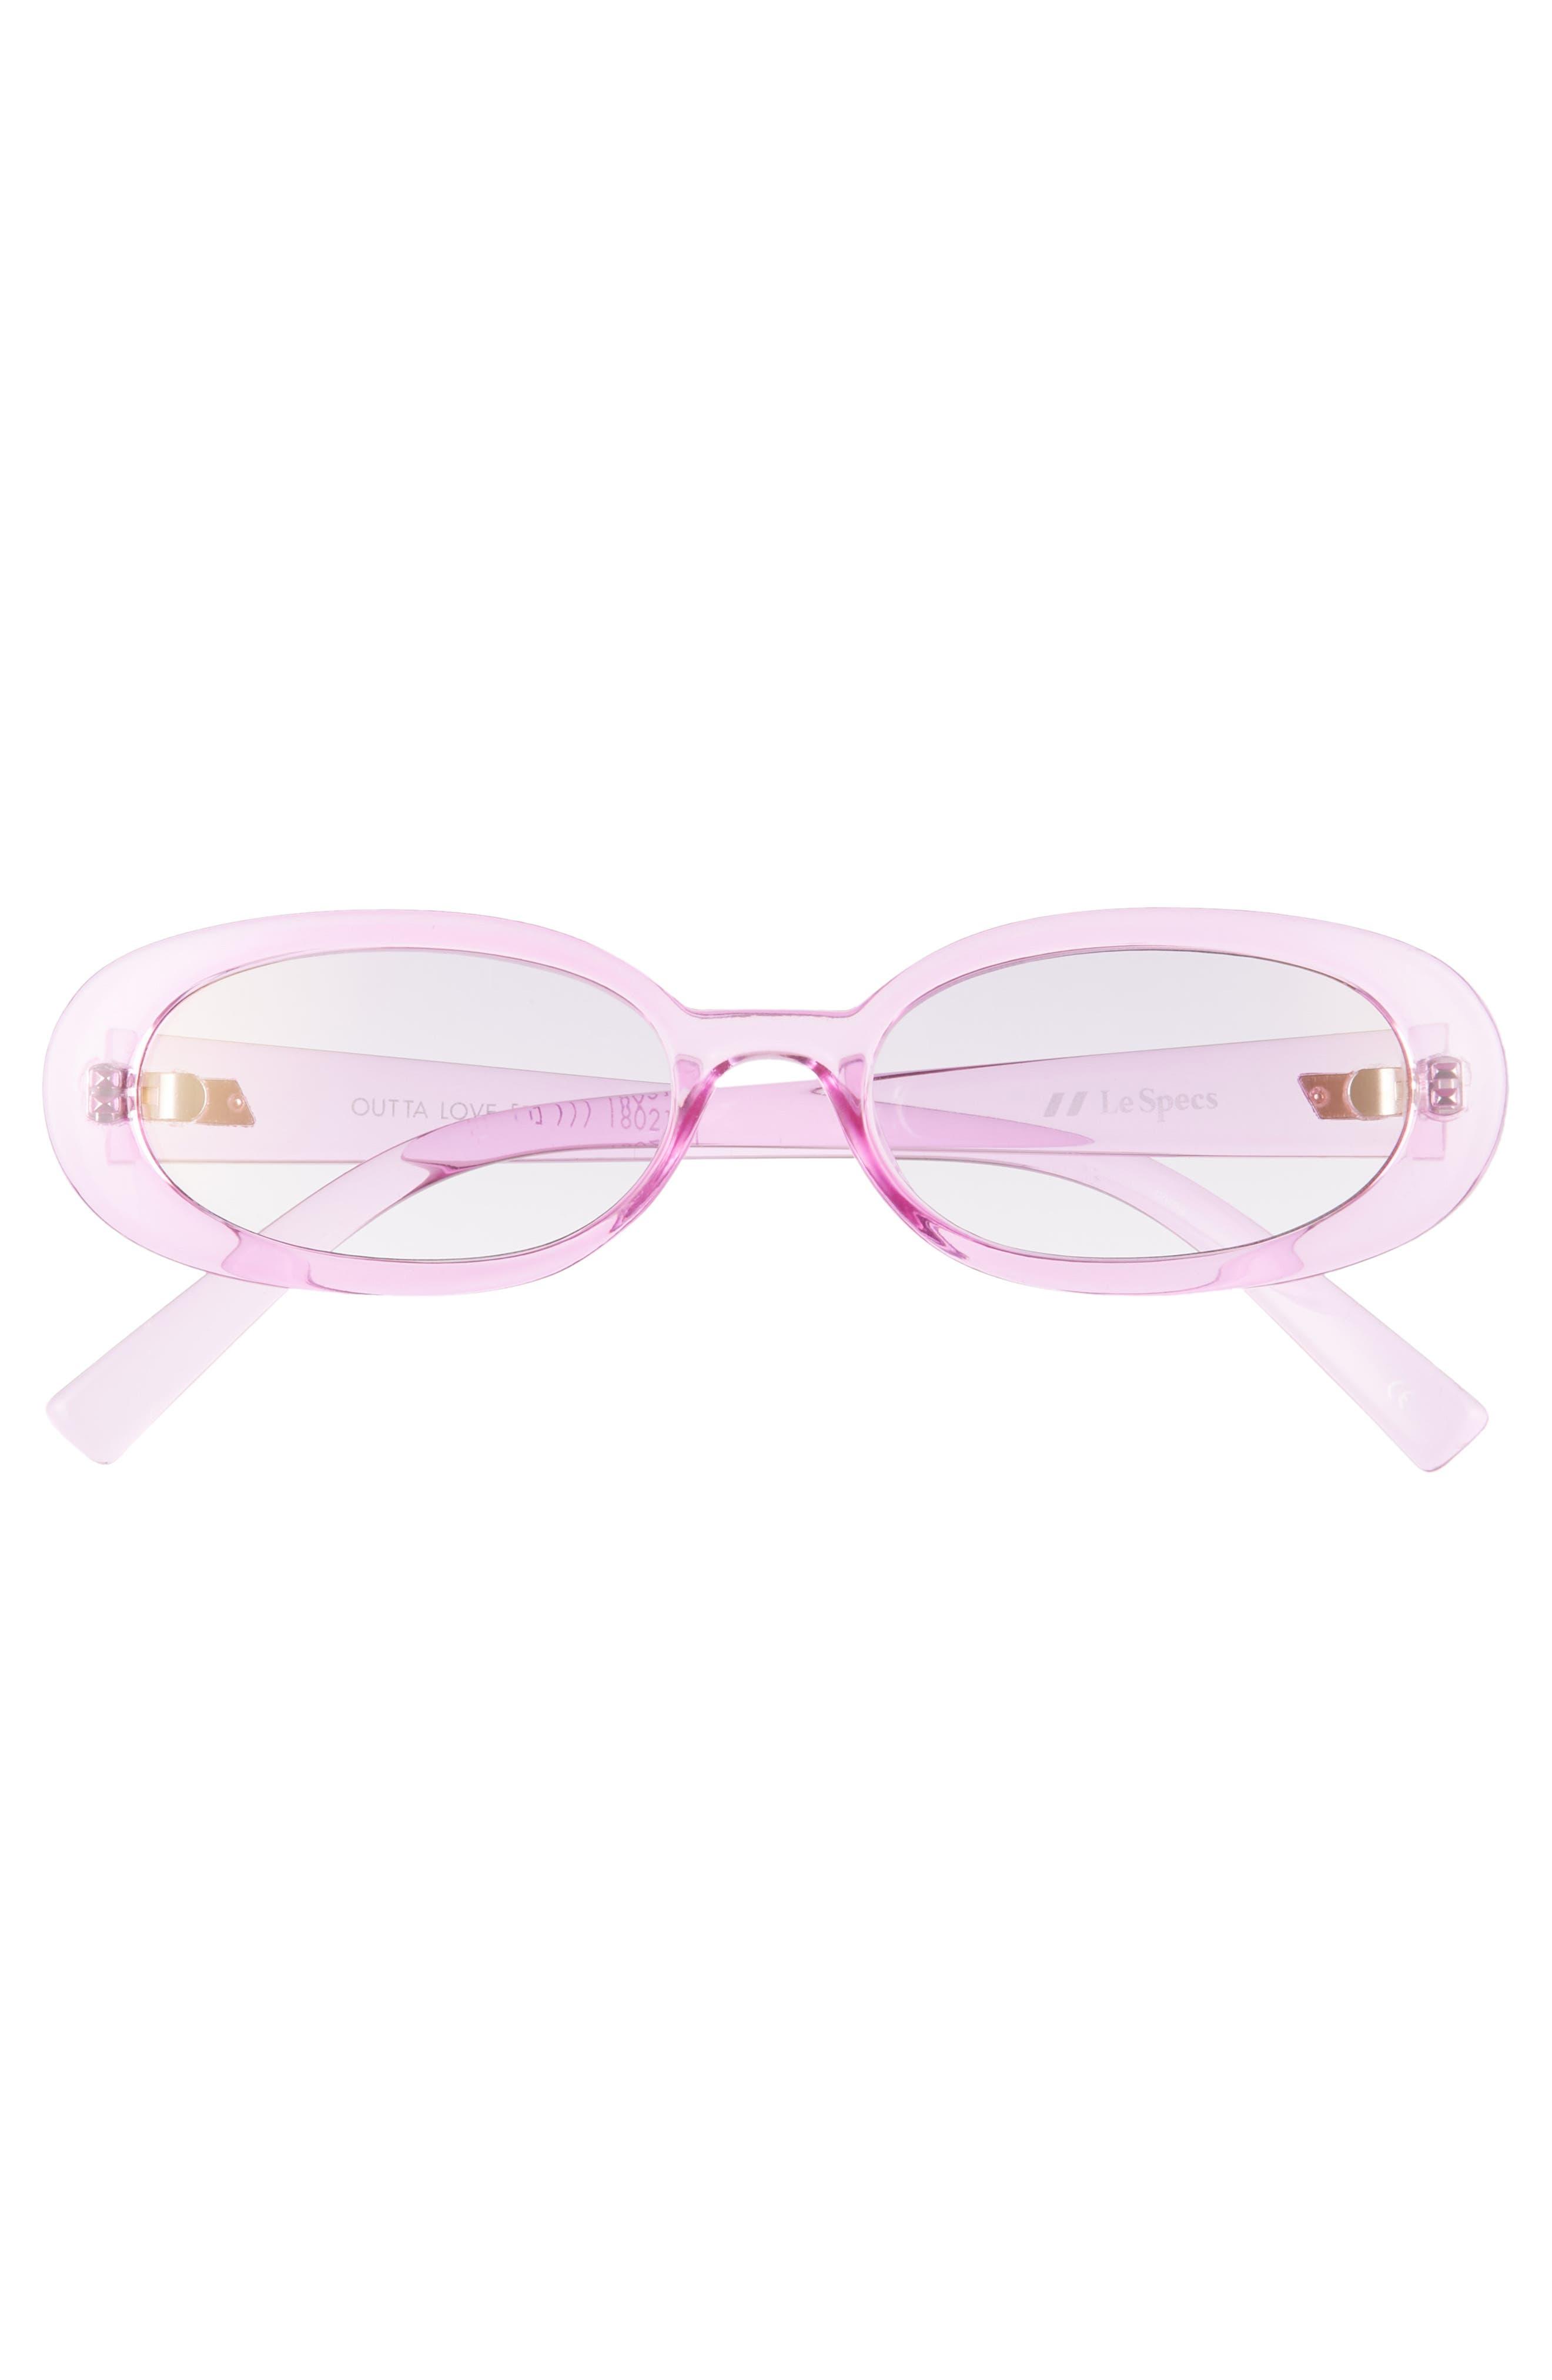 Outta Love 49mm Cat Eye Sunglasses,                             Alternate thumbnail 3, color,                             Powder-Puff